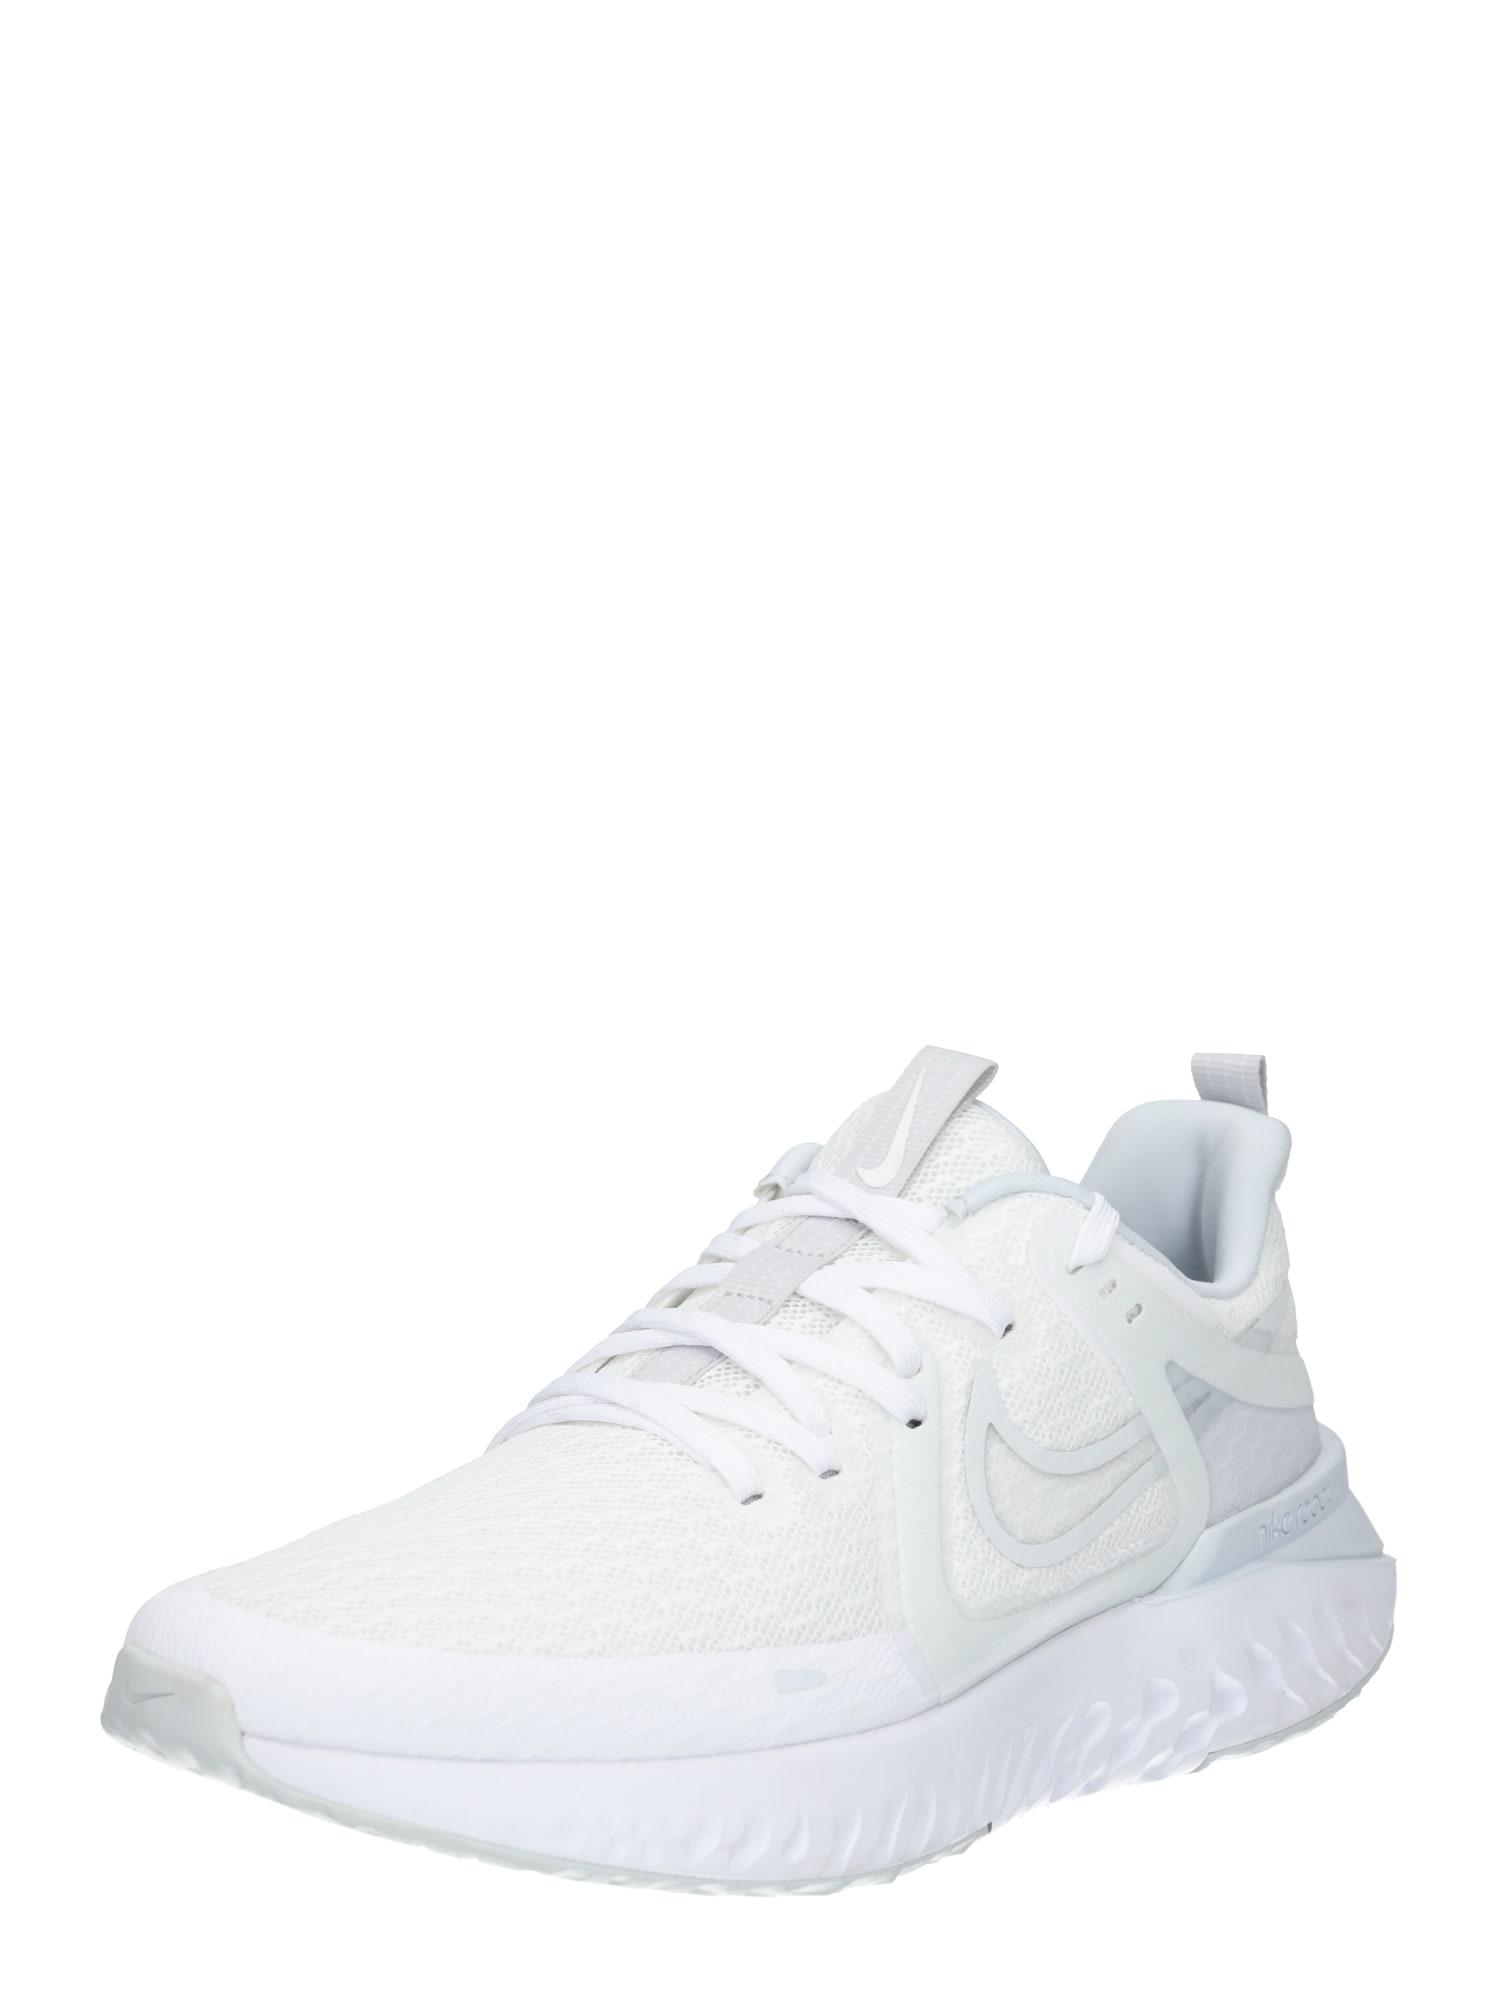 Běžecká obuv LEGEND REACT 2 bílá NIKE